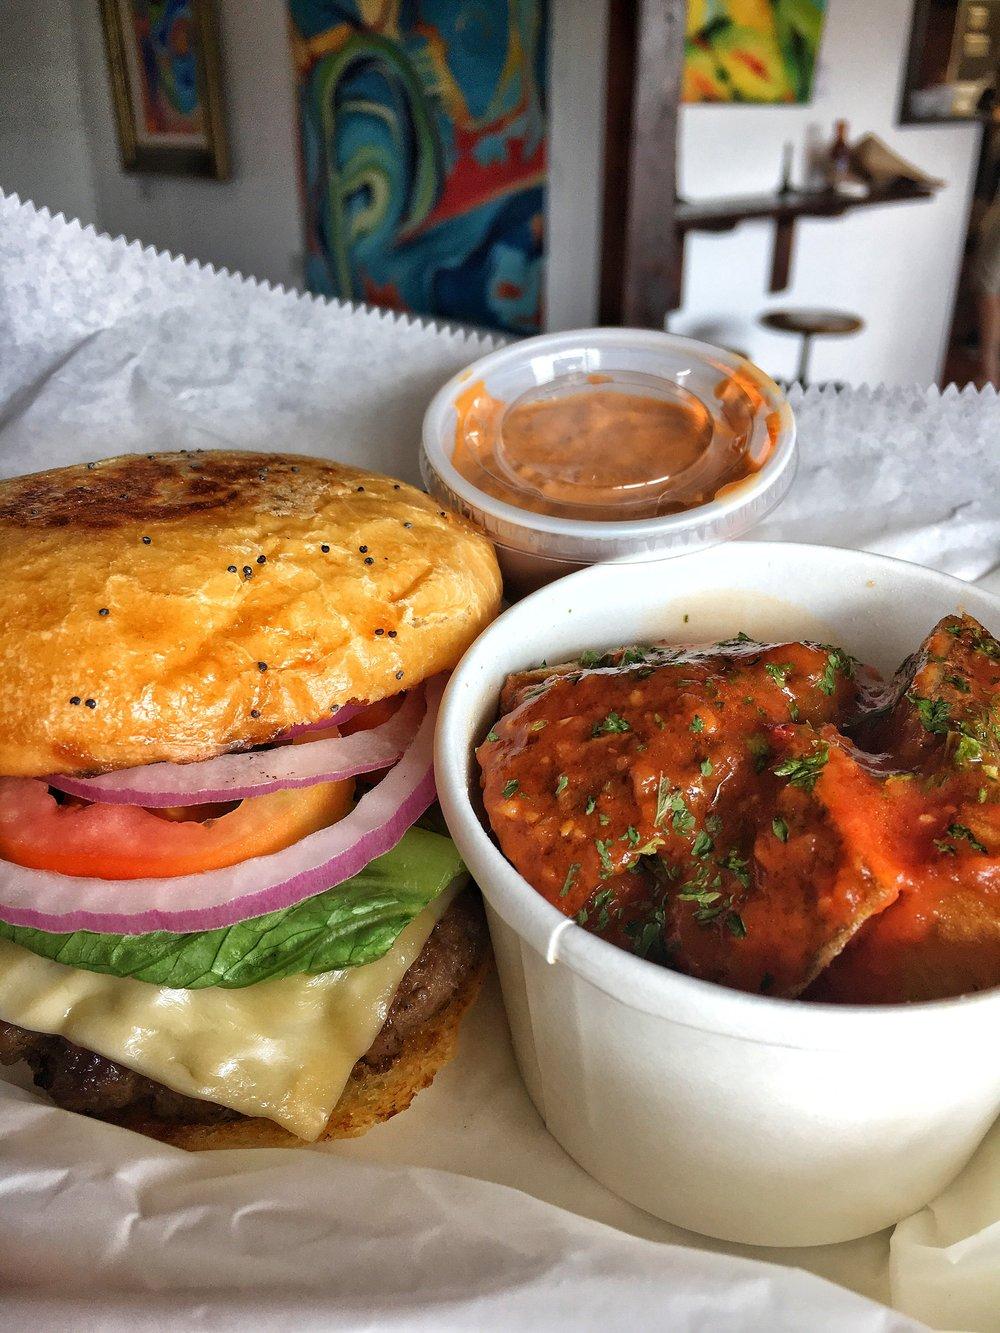 FFF Burger from ASADA with Papas Bravas + Morita Chile Mayo